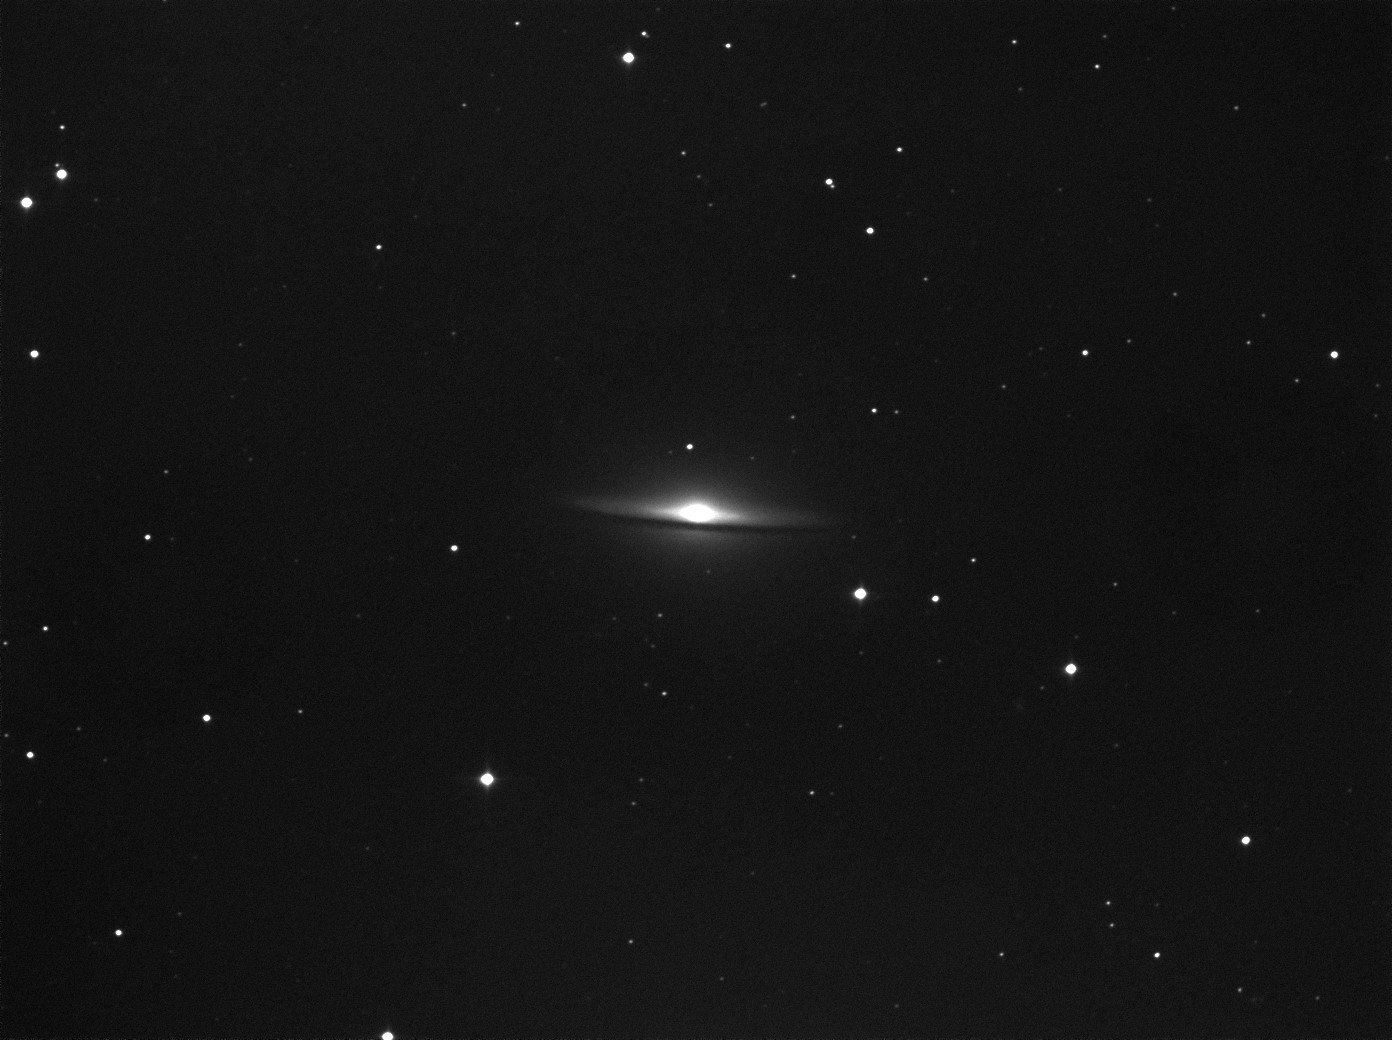 M107 15x60s B1 LPS P2 Sombrero Galaxy